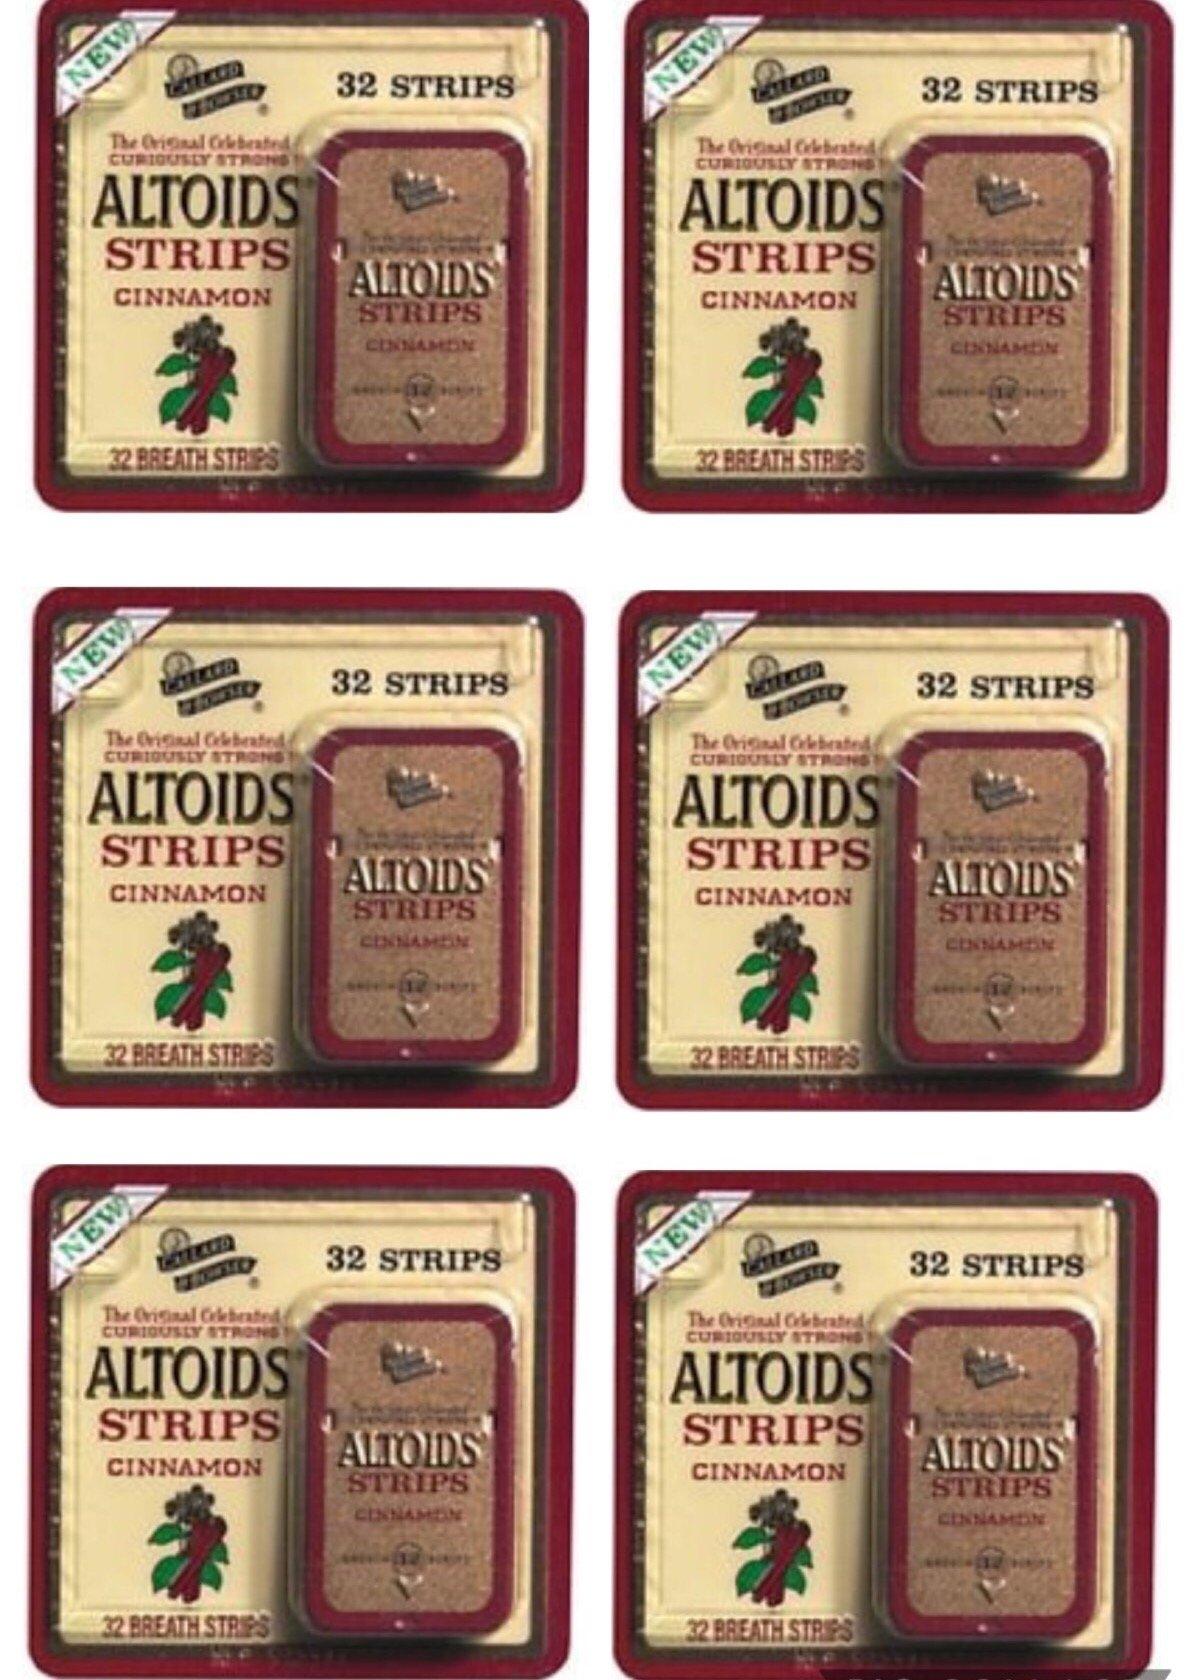 Altoids Breath Strips Cinnamon 32 Strips (Pack of 6 Tins)